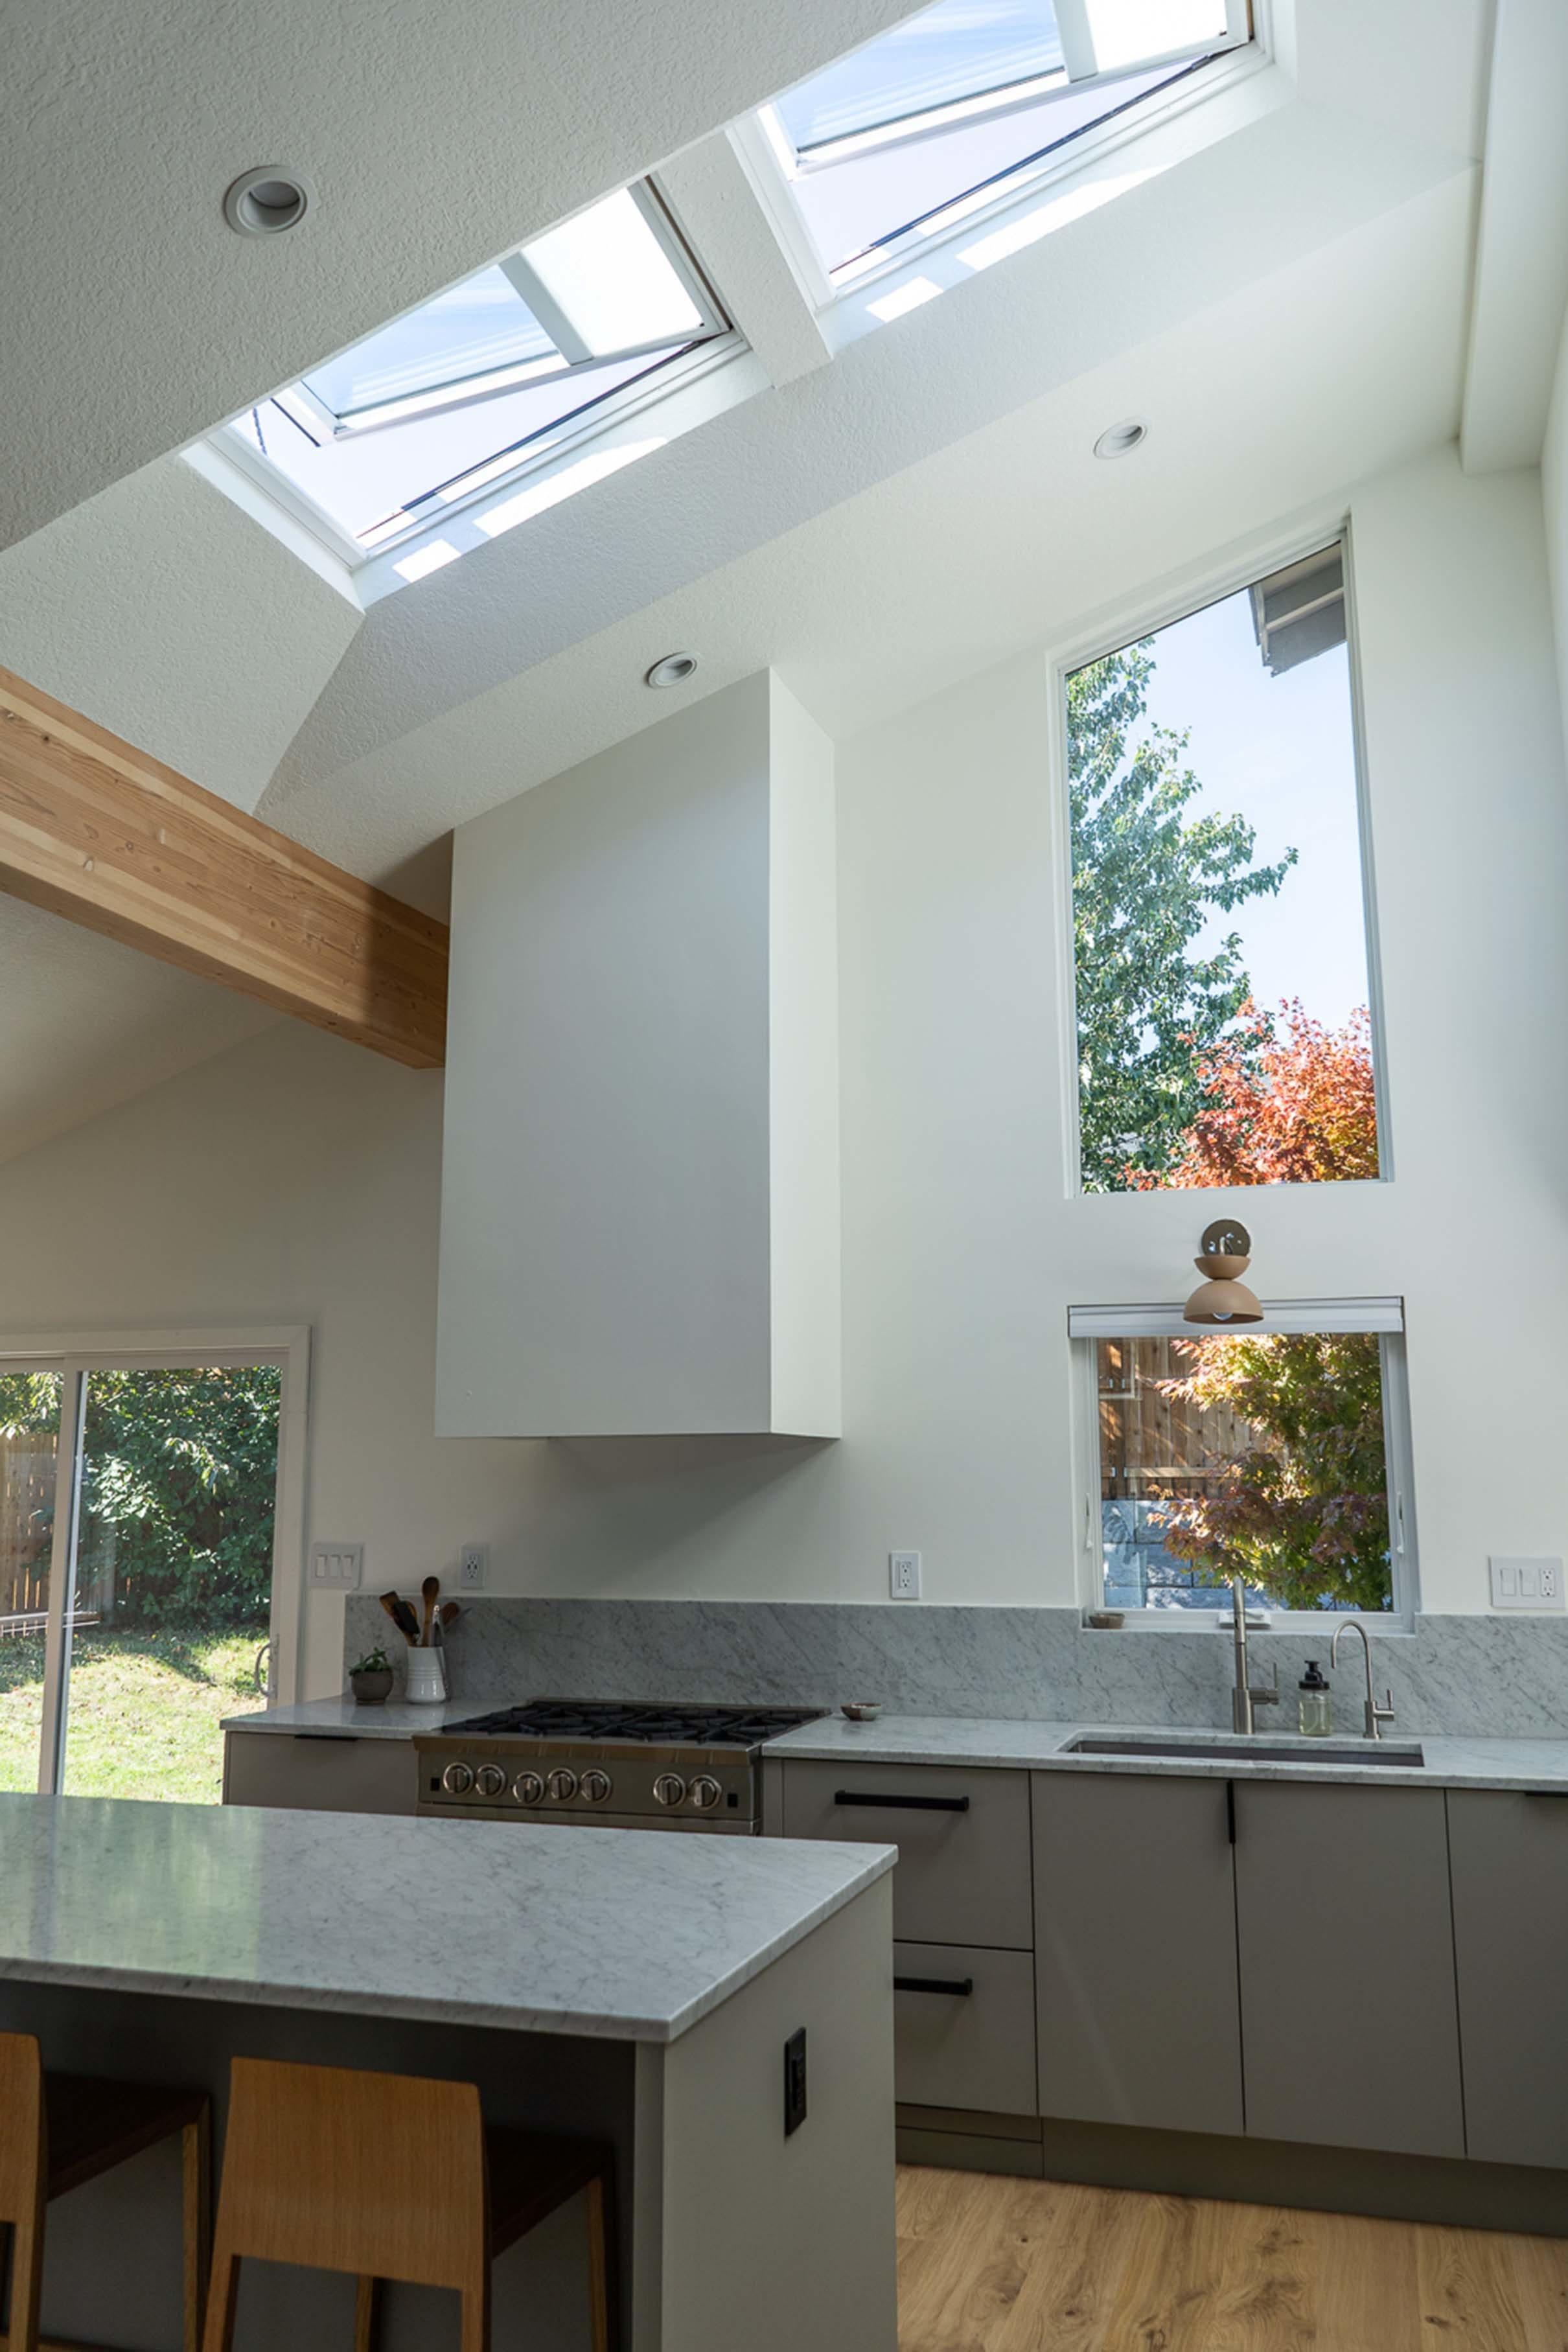 Kitchen skylights angled